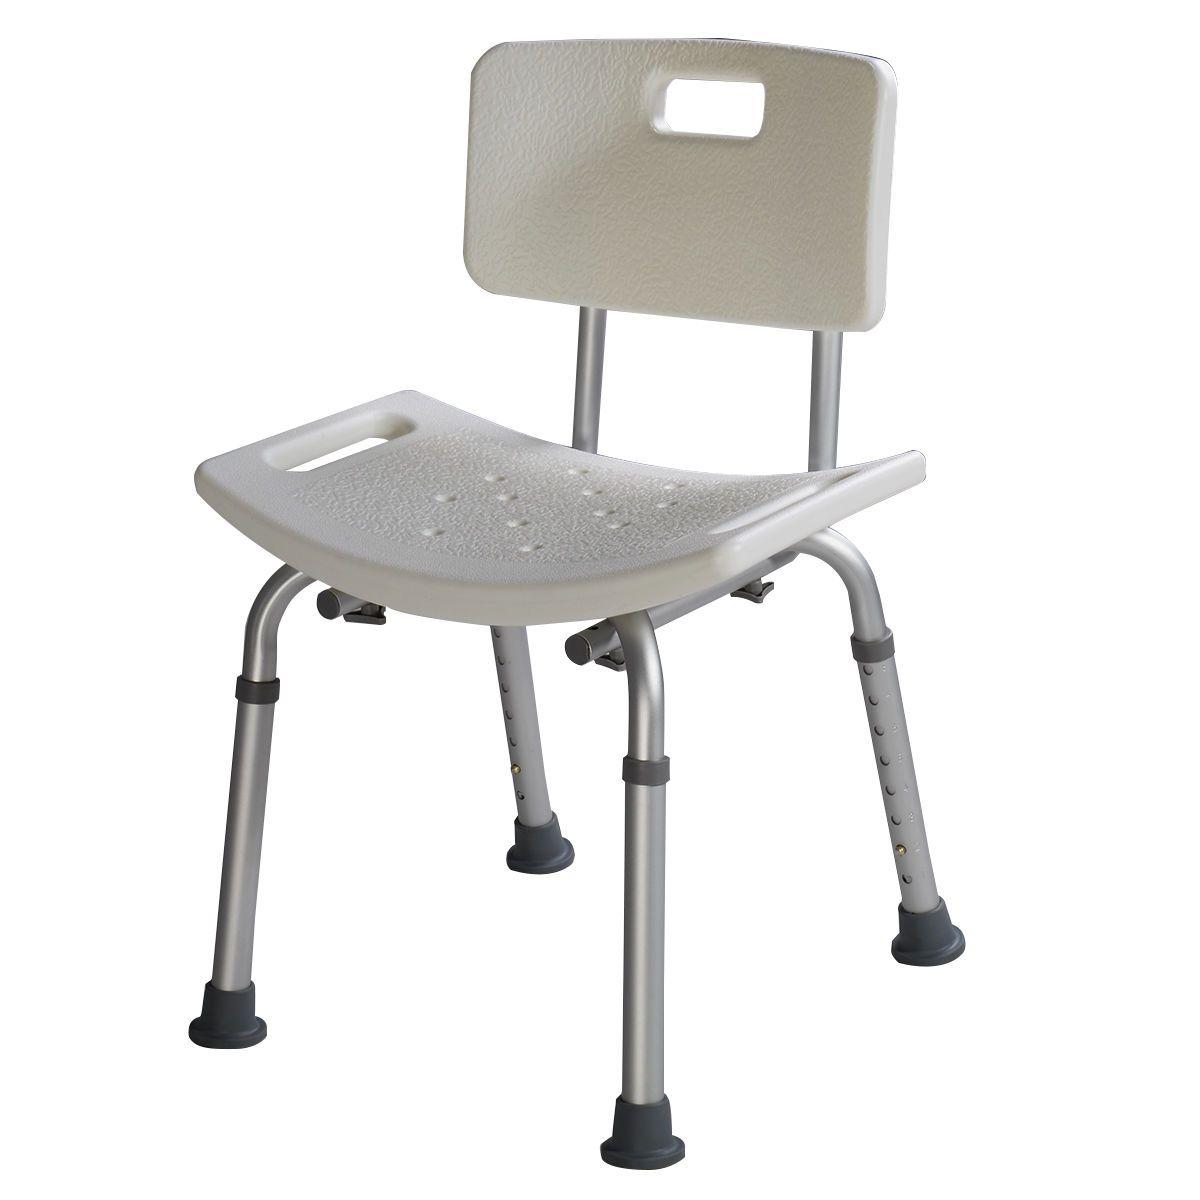 8 Height Adjustable Medical Shower Bath Chair Bathtub Stool Detachable  Backrest